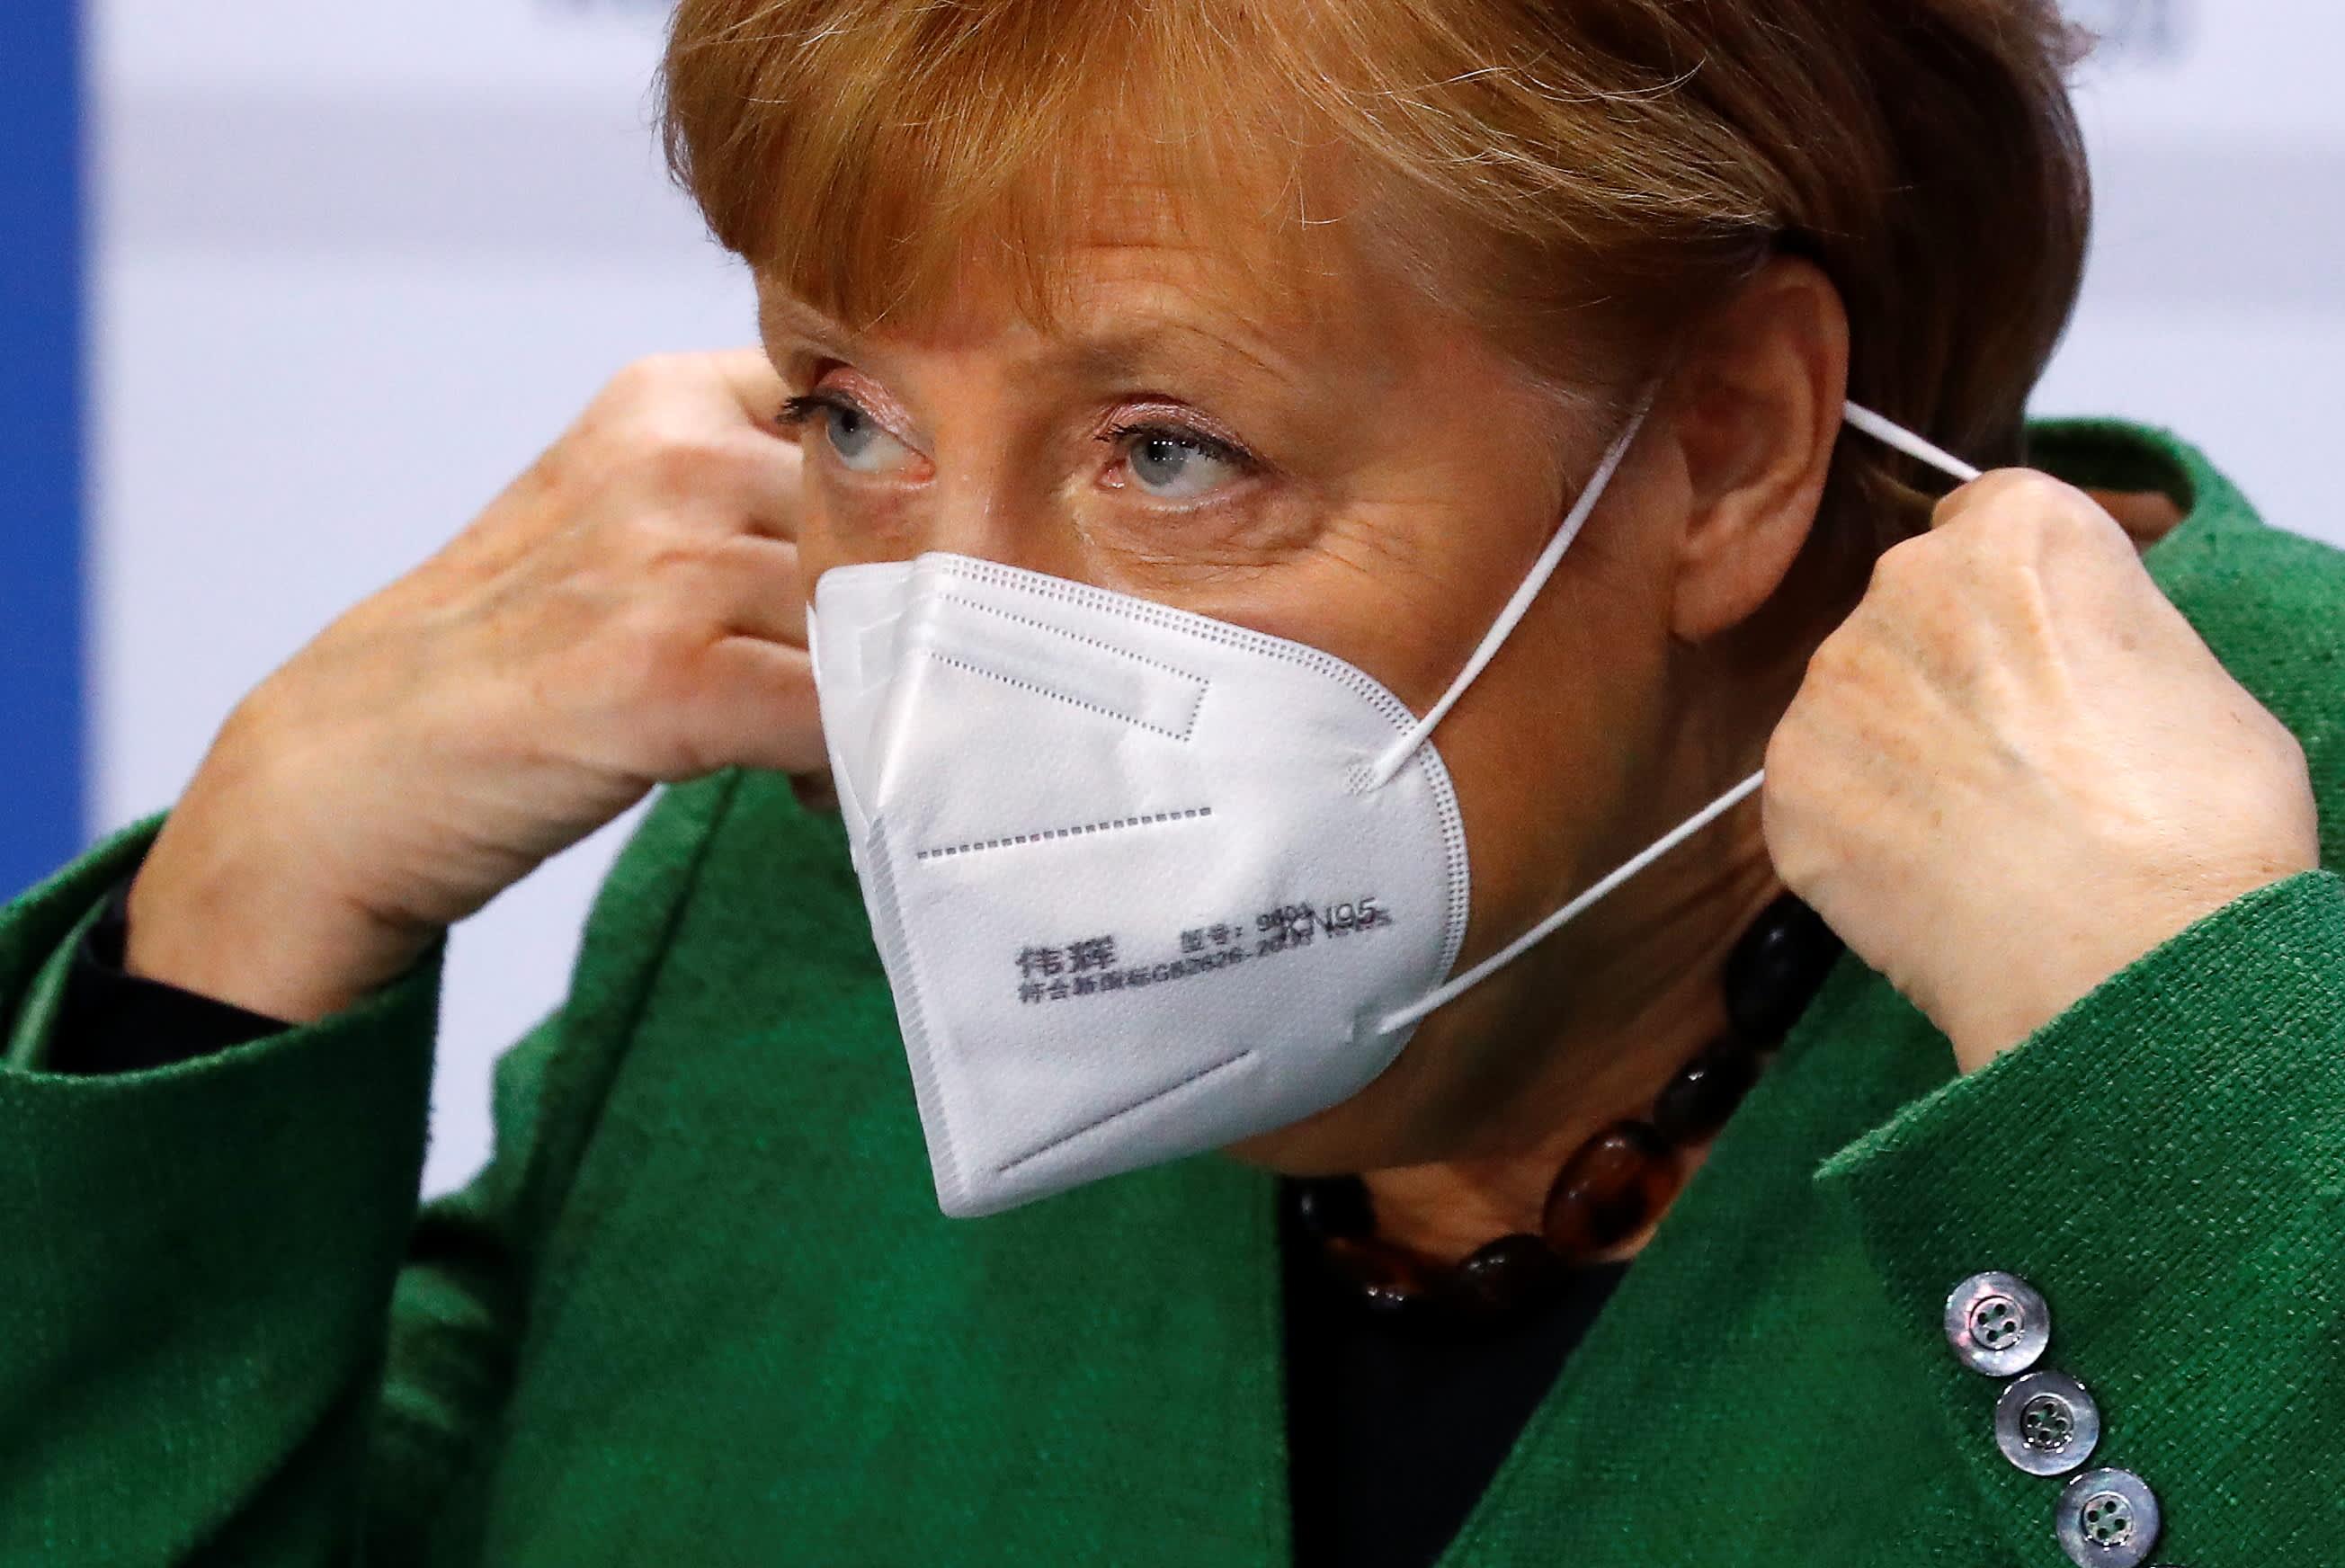 Germany's Merkel admits 'mistake' and reverses Easter lockdown – CNBC